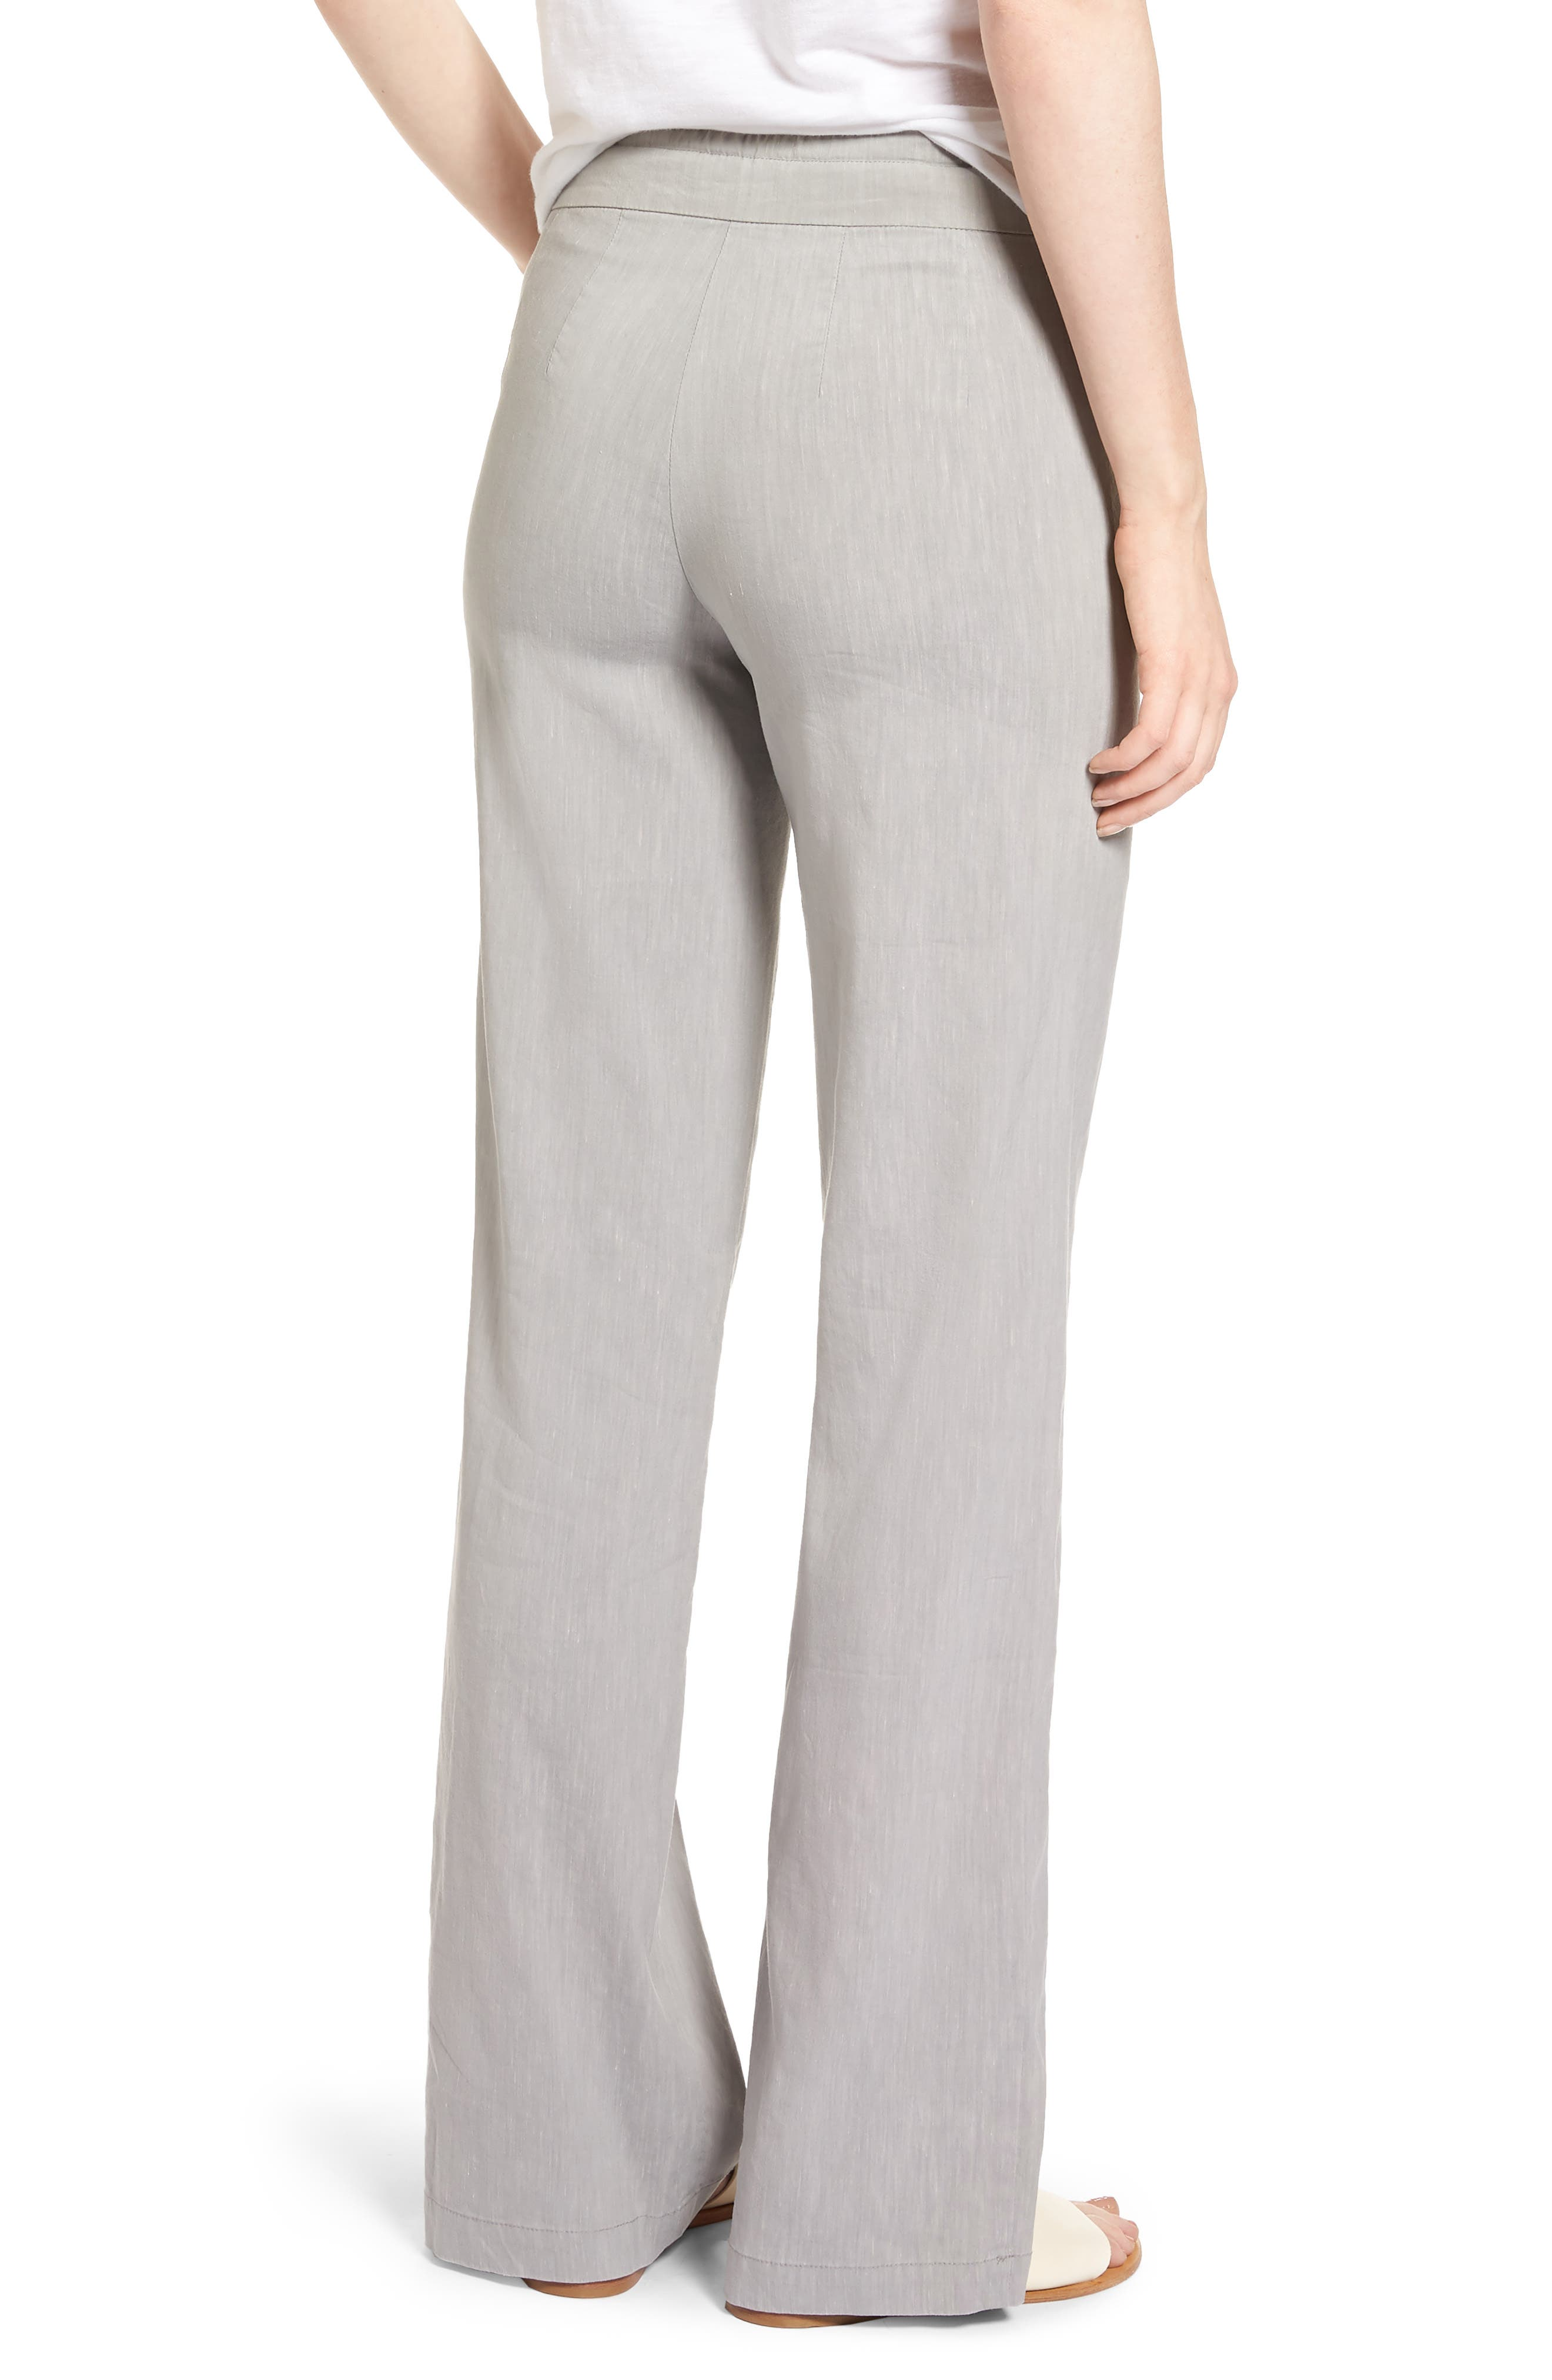 Traveling Linen Blend Stretch Pants,                             Alternate thumbnail 2, color,                             050